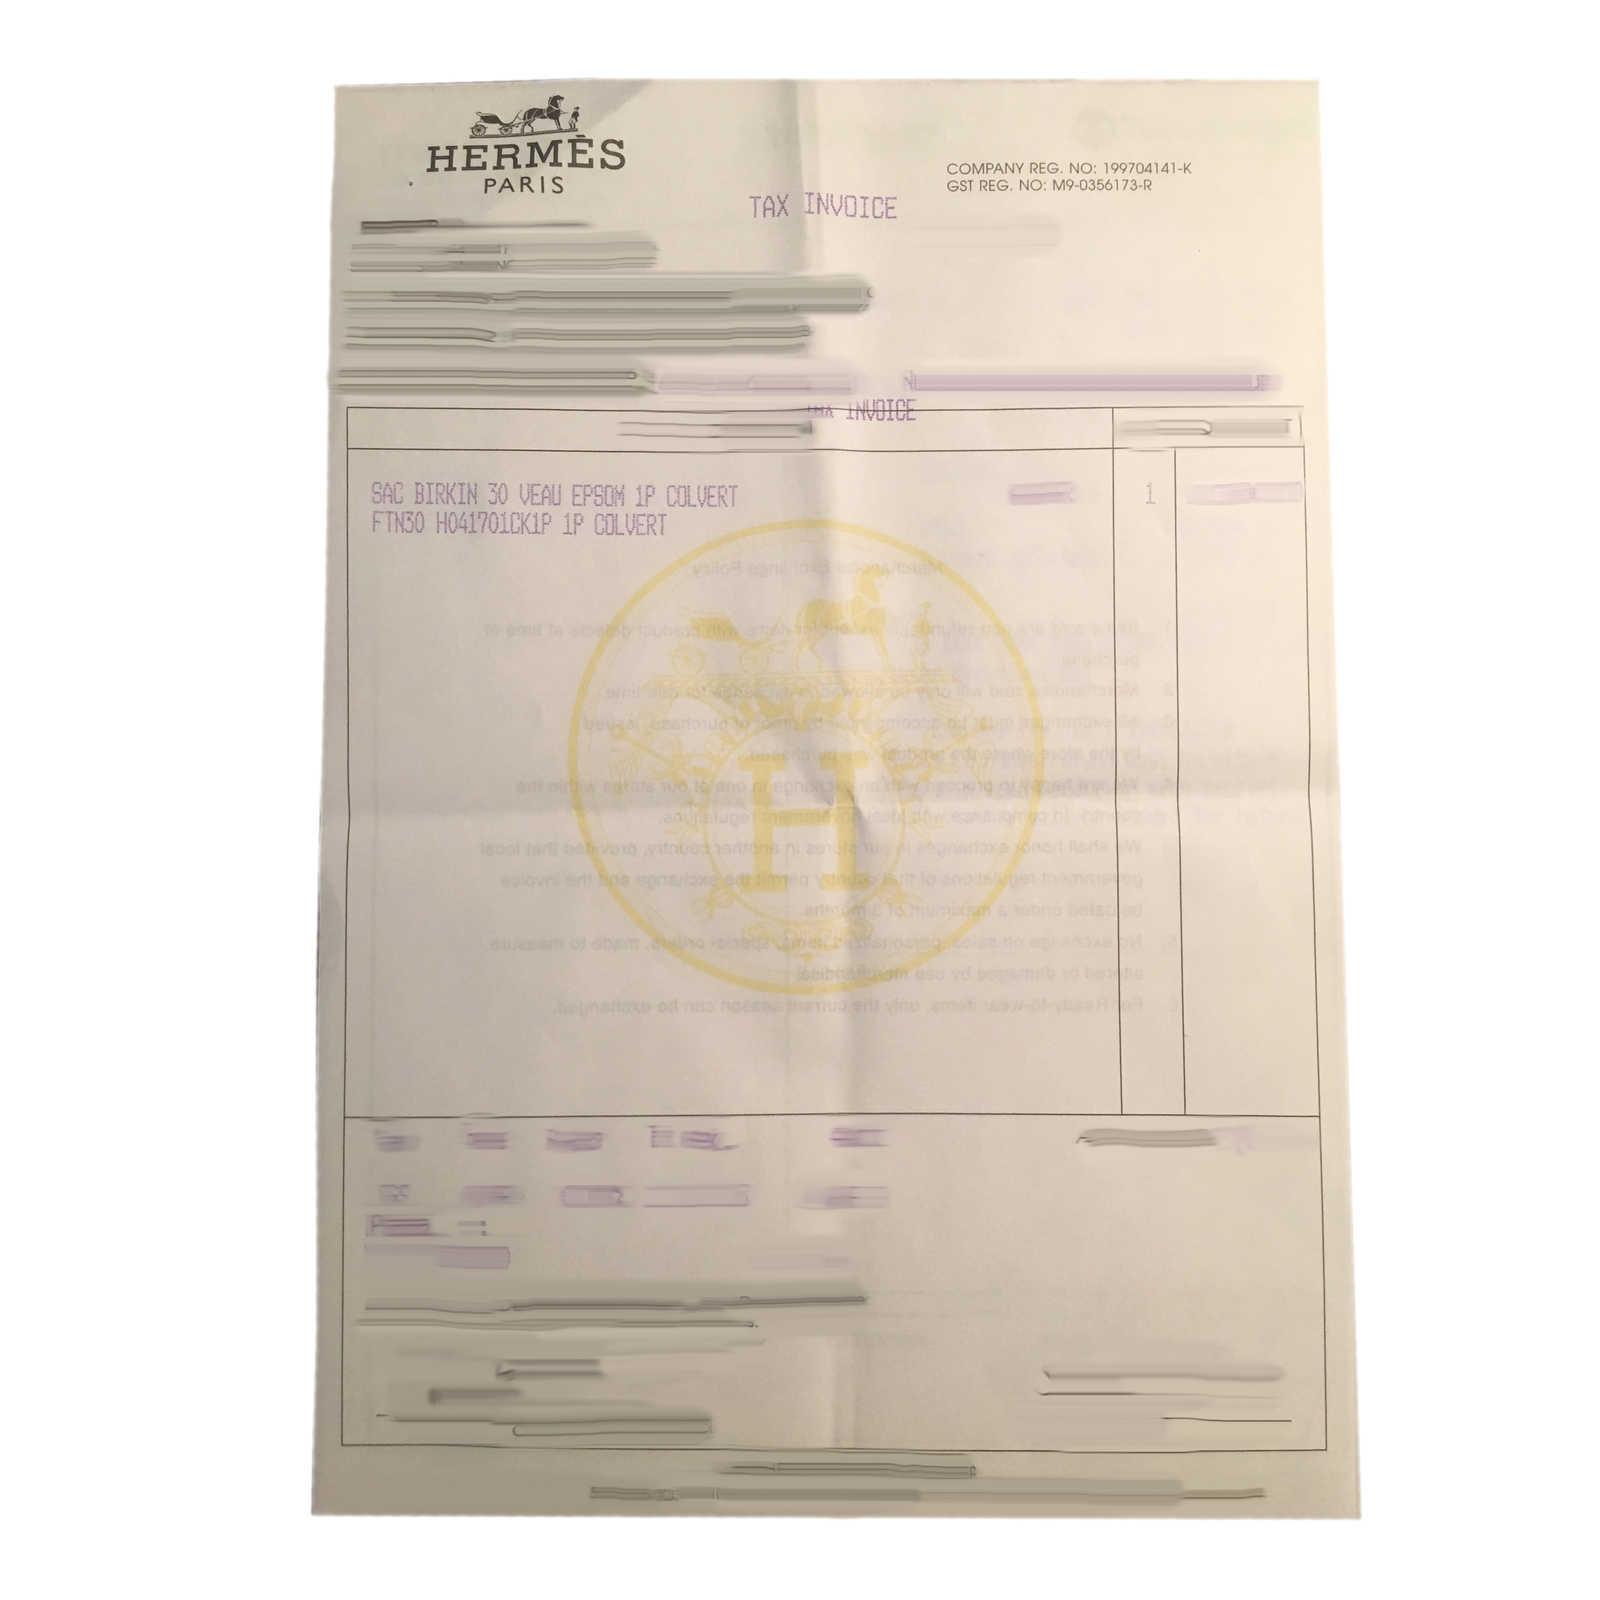 e2fcc770f7 ... Authentic Second Hand Hermès Colvert Birkin 30 (PSS-145-00070) -  Thumbnail